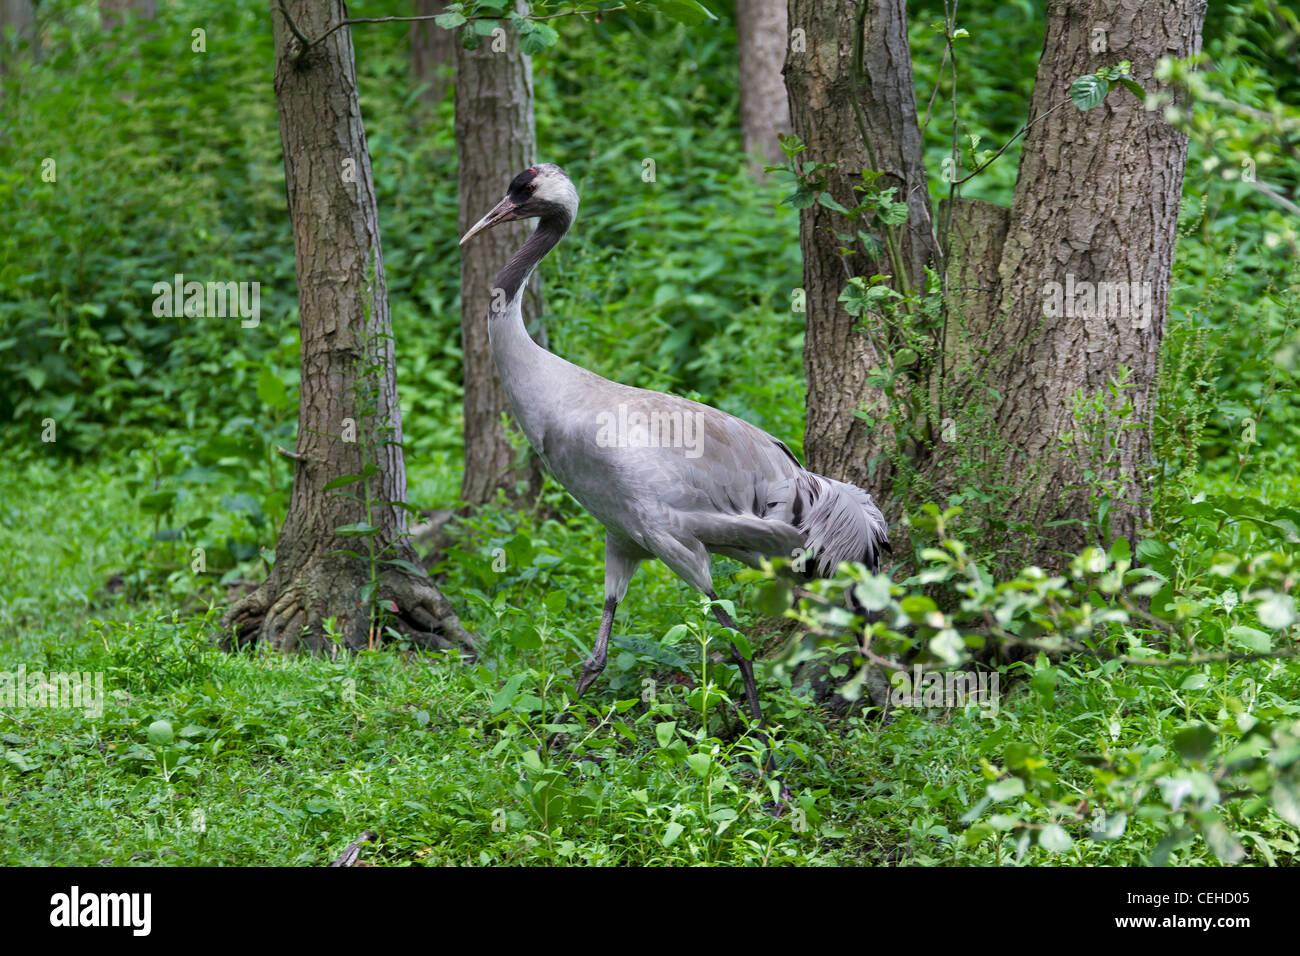 Eurasian Crane (Grus grus) in marshland, Germany - Stock Image